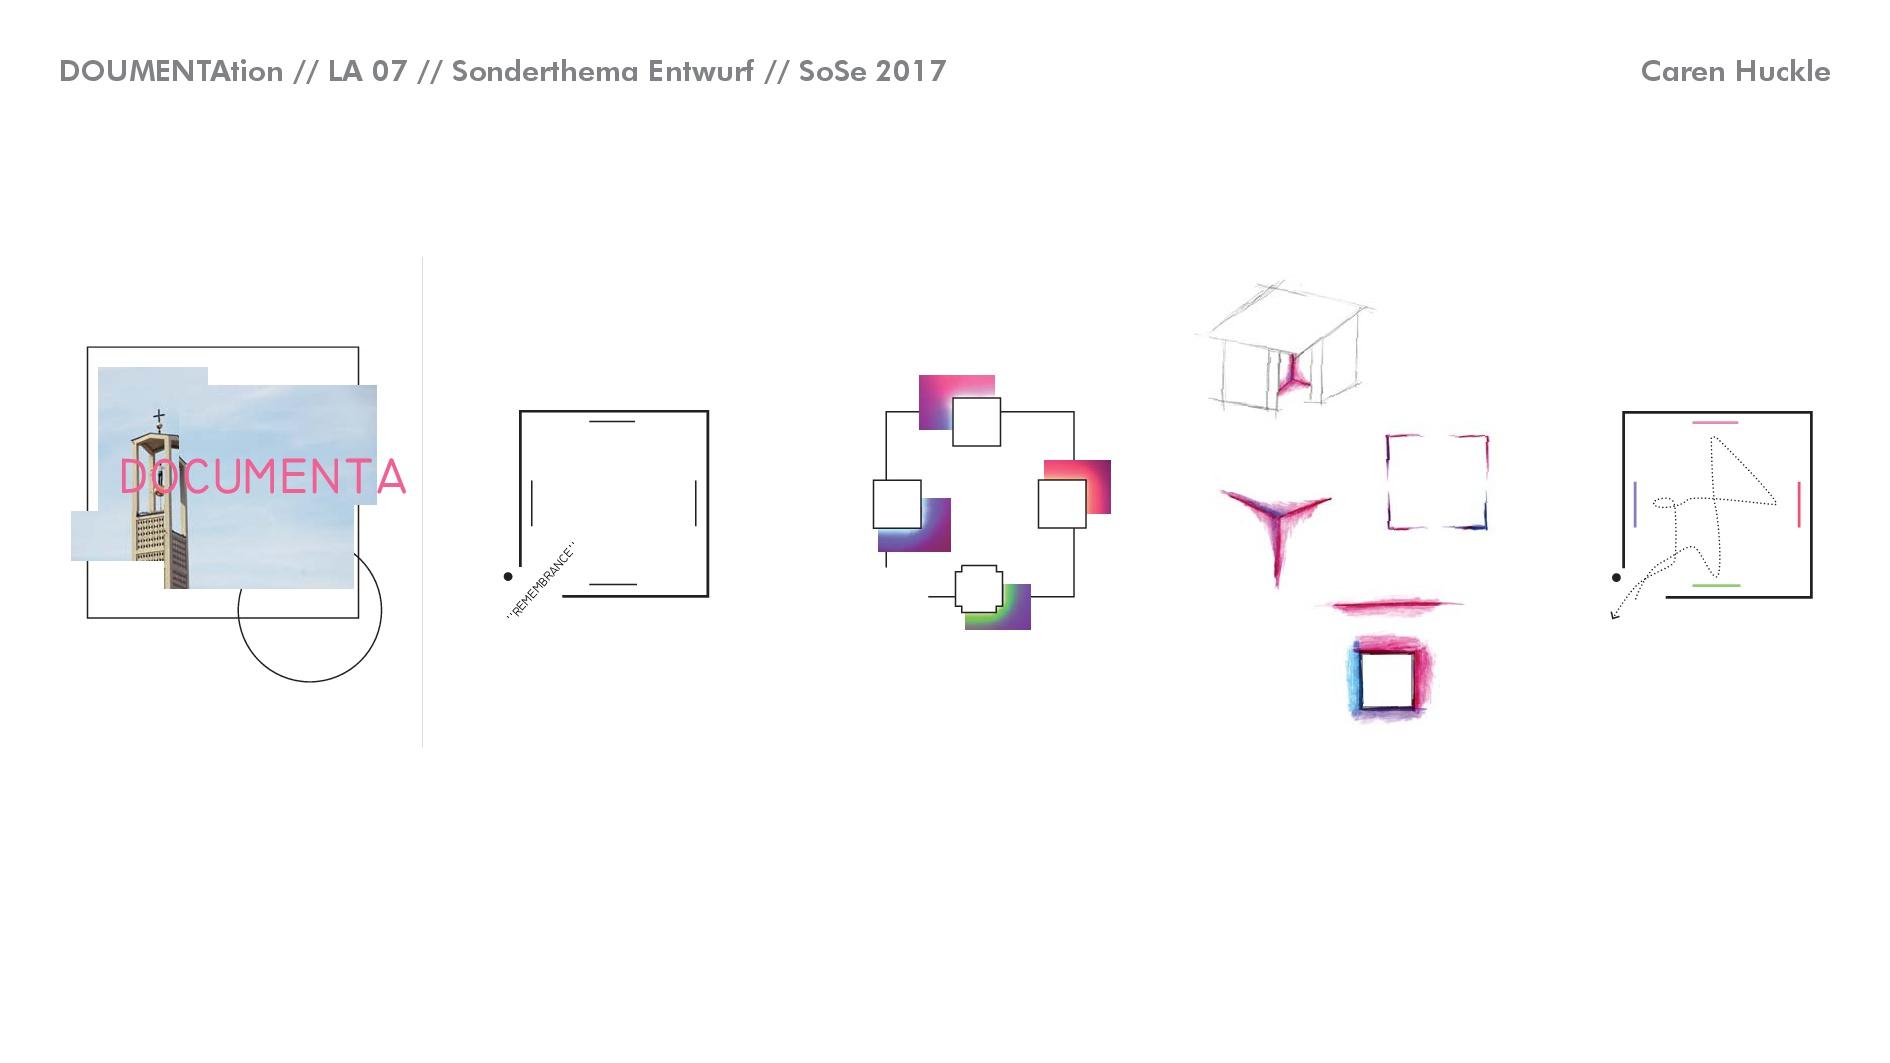 NEU Sonderthema Entwerfen SoSe 17 002